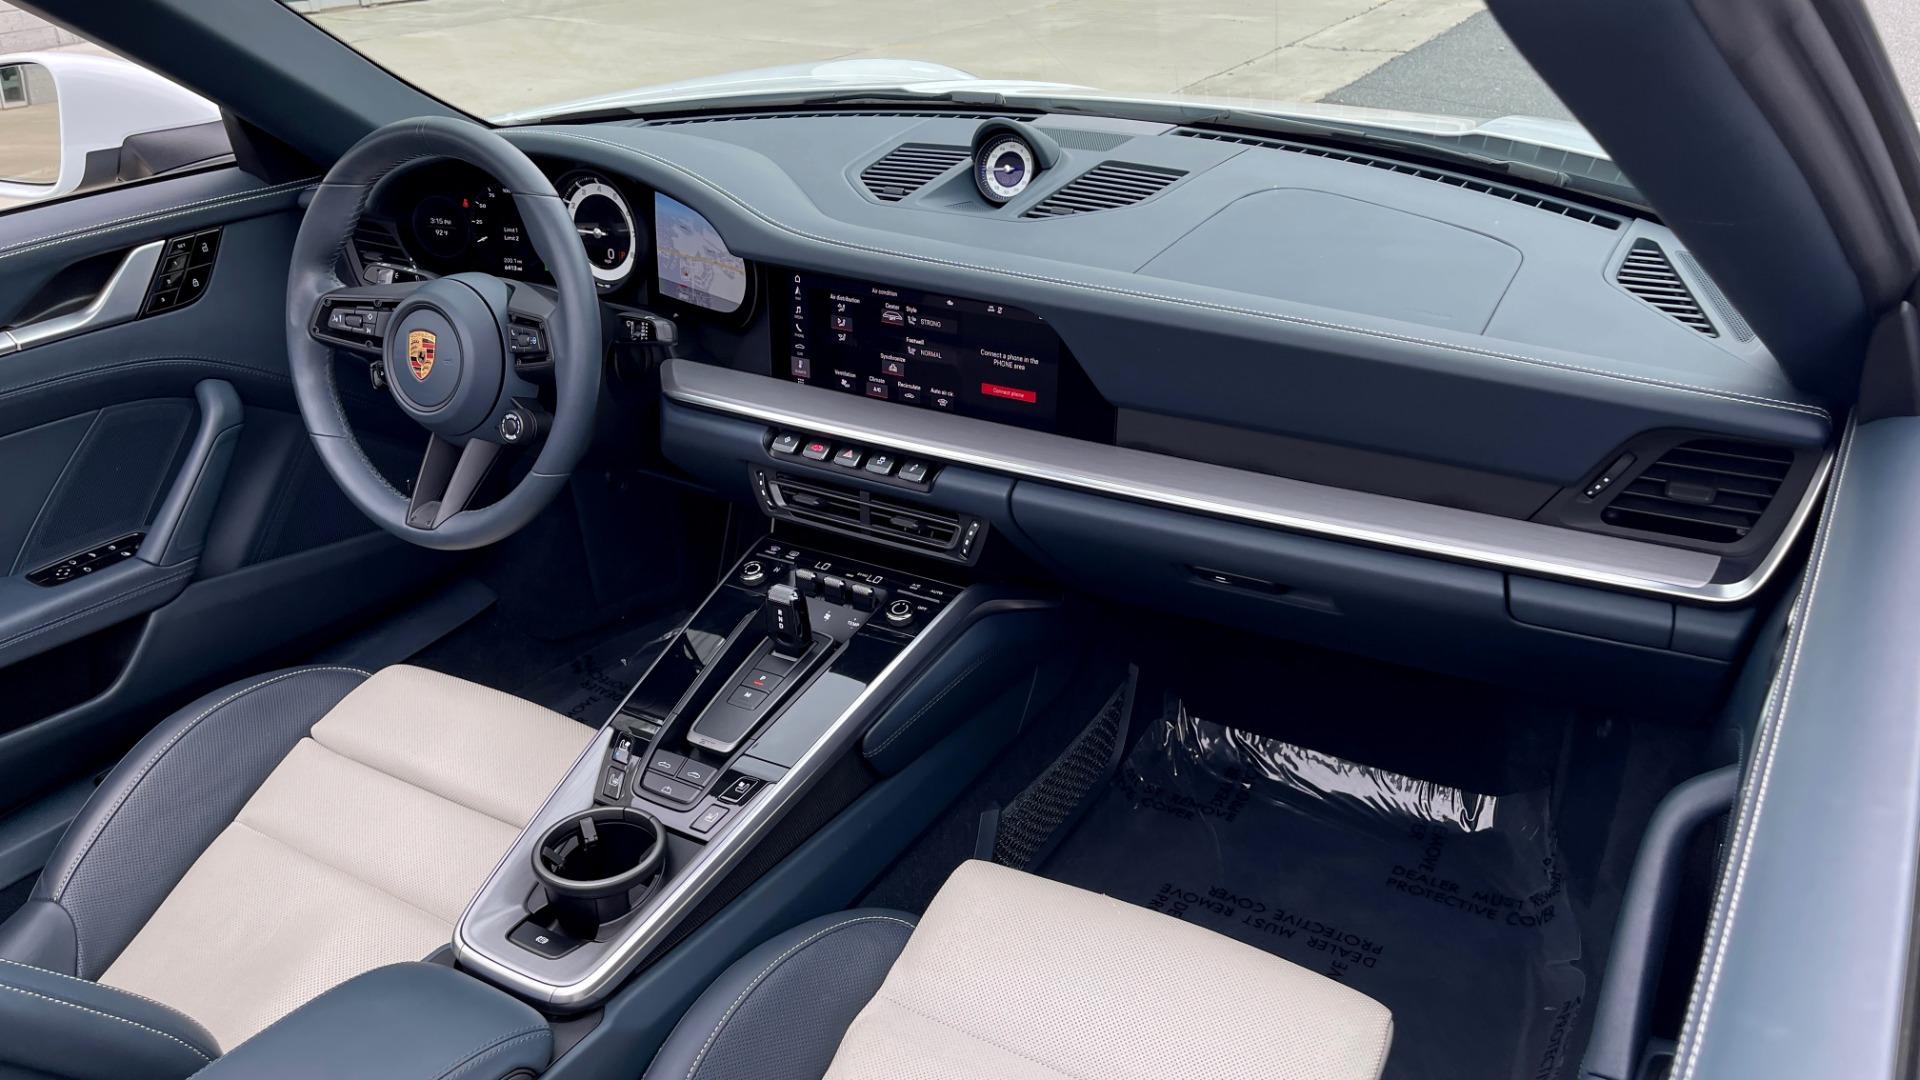 Used 2020 Porsche 911 CARRERA 4S CABRIOLET PREMIUM SPORT PKG / NAV / BOSE / LIGHT DESIGN PKG for sale $167,595 at Formula Imports in Charlotte NC 28227 76